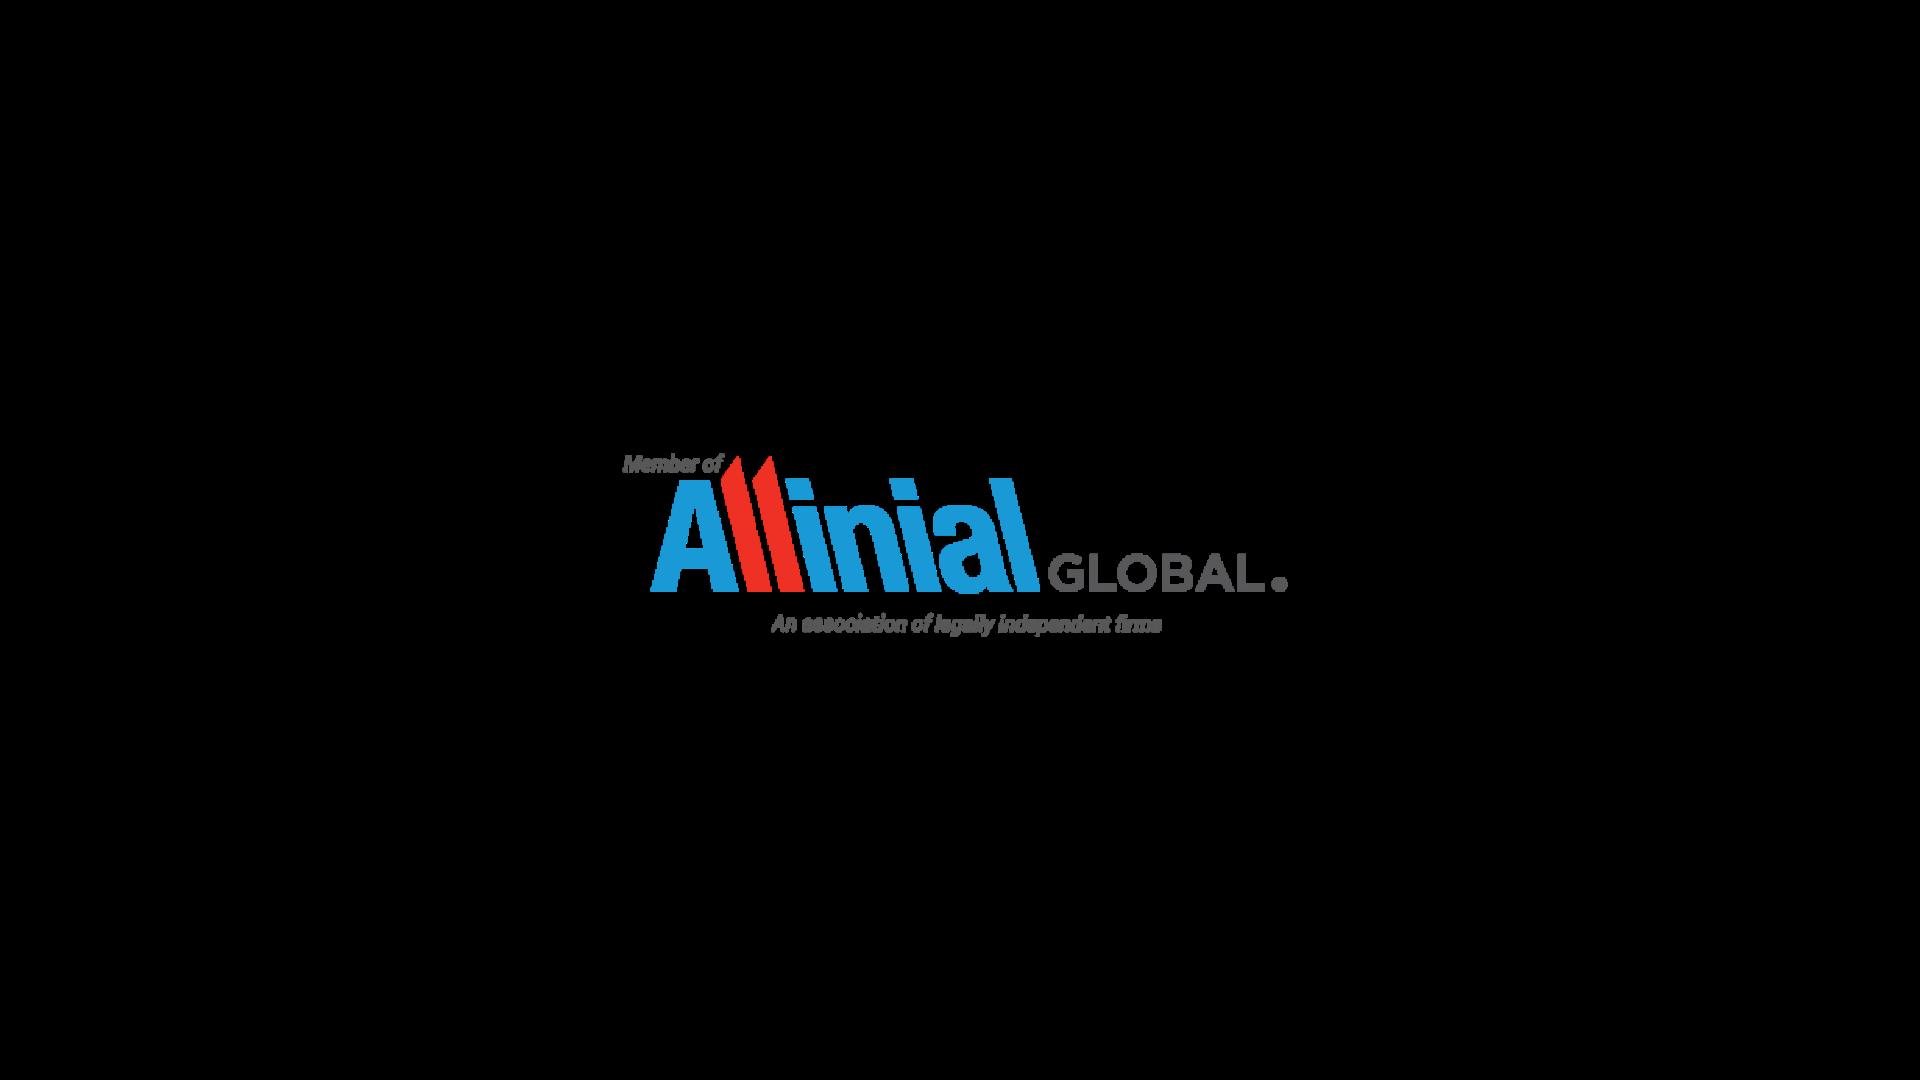 allinialgloballogo.png